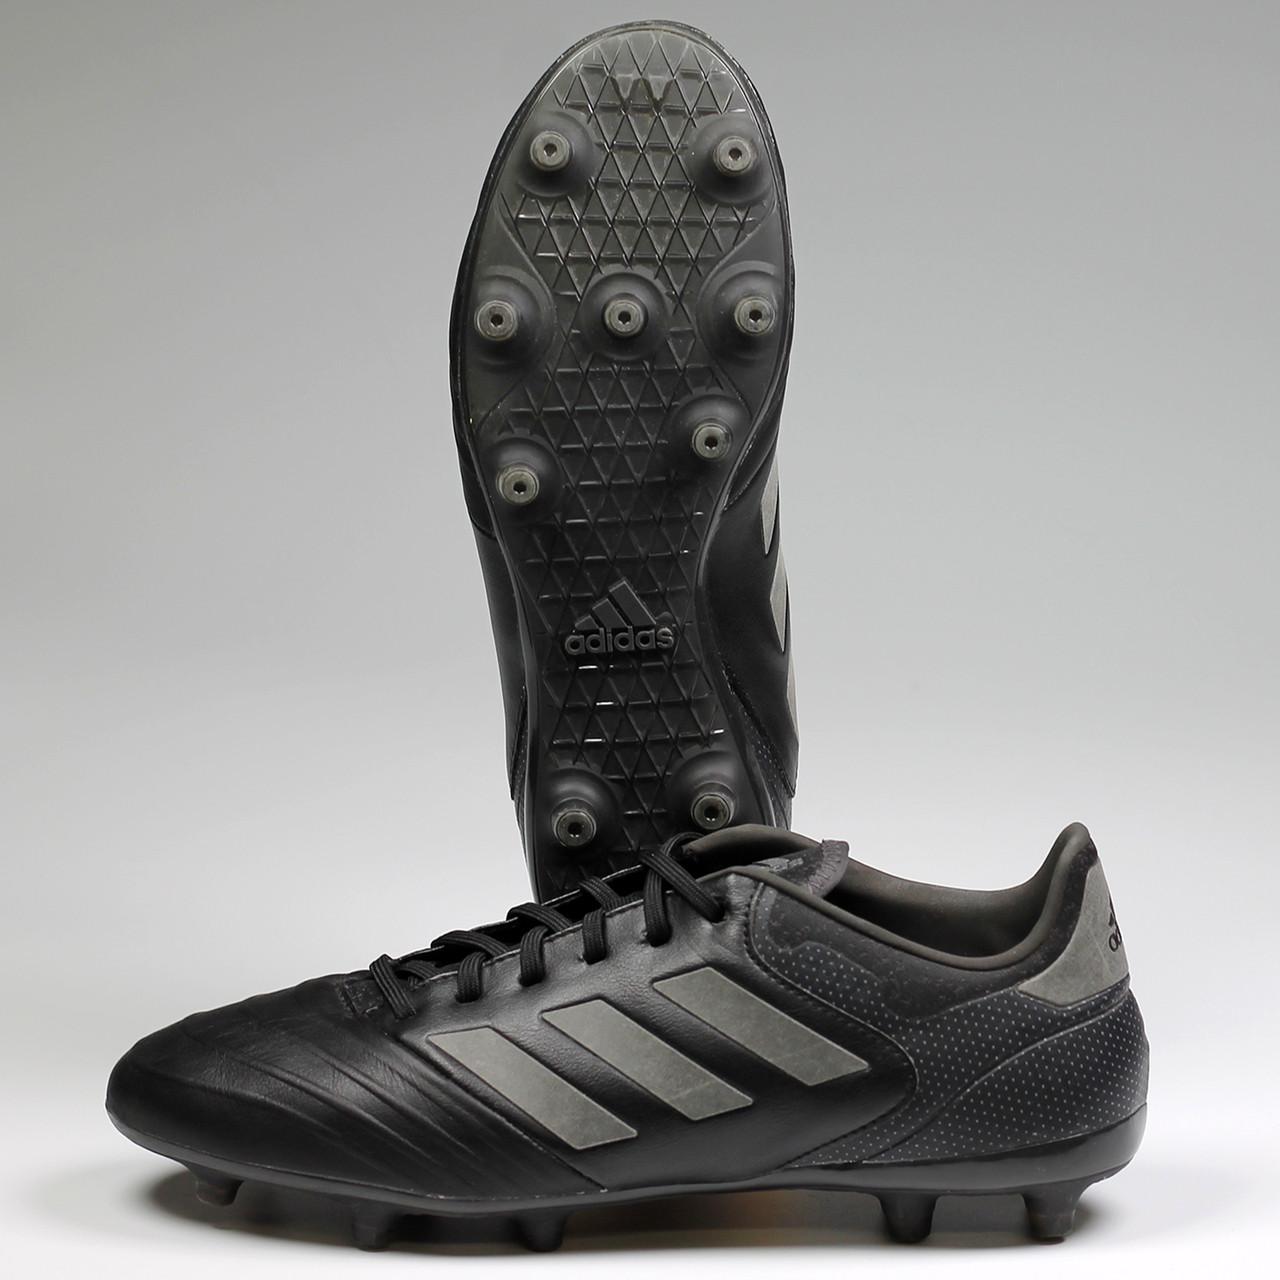 the best attitude 70fd5 dcf54 Adidas Copa 18.2 FG Mens Soccer Cleats CP8954 - Black